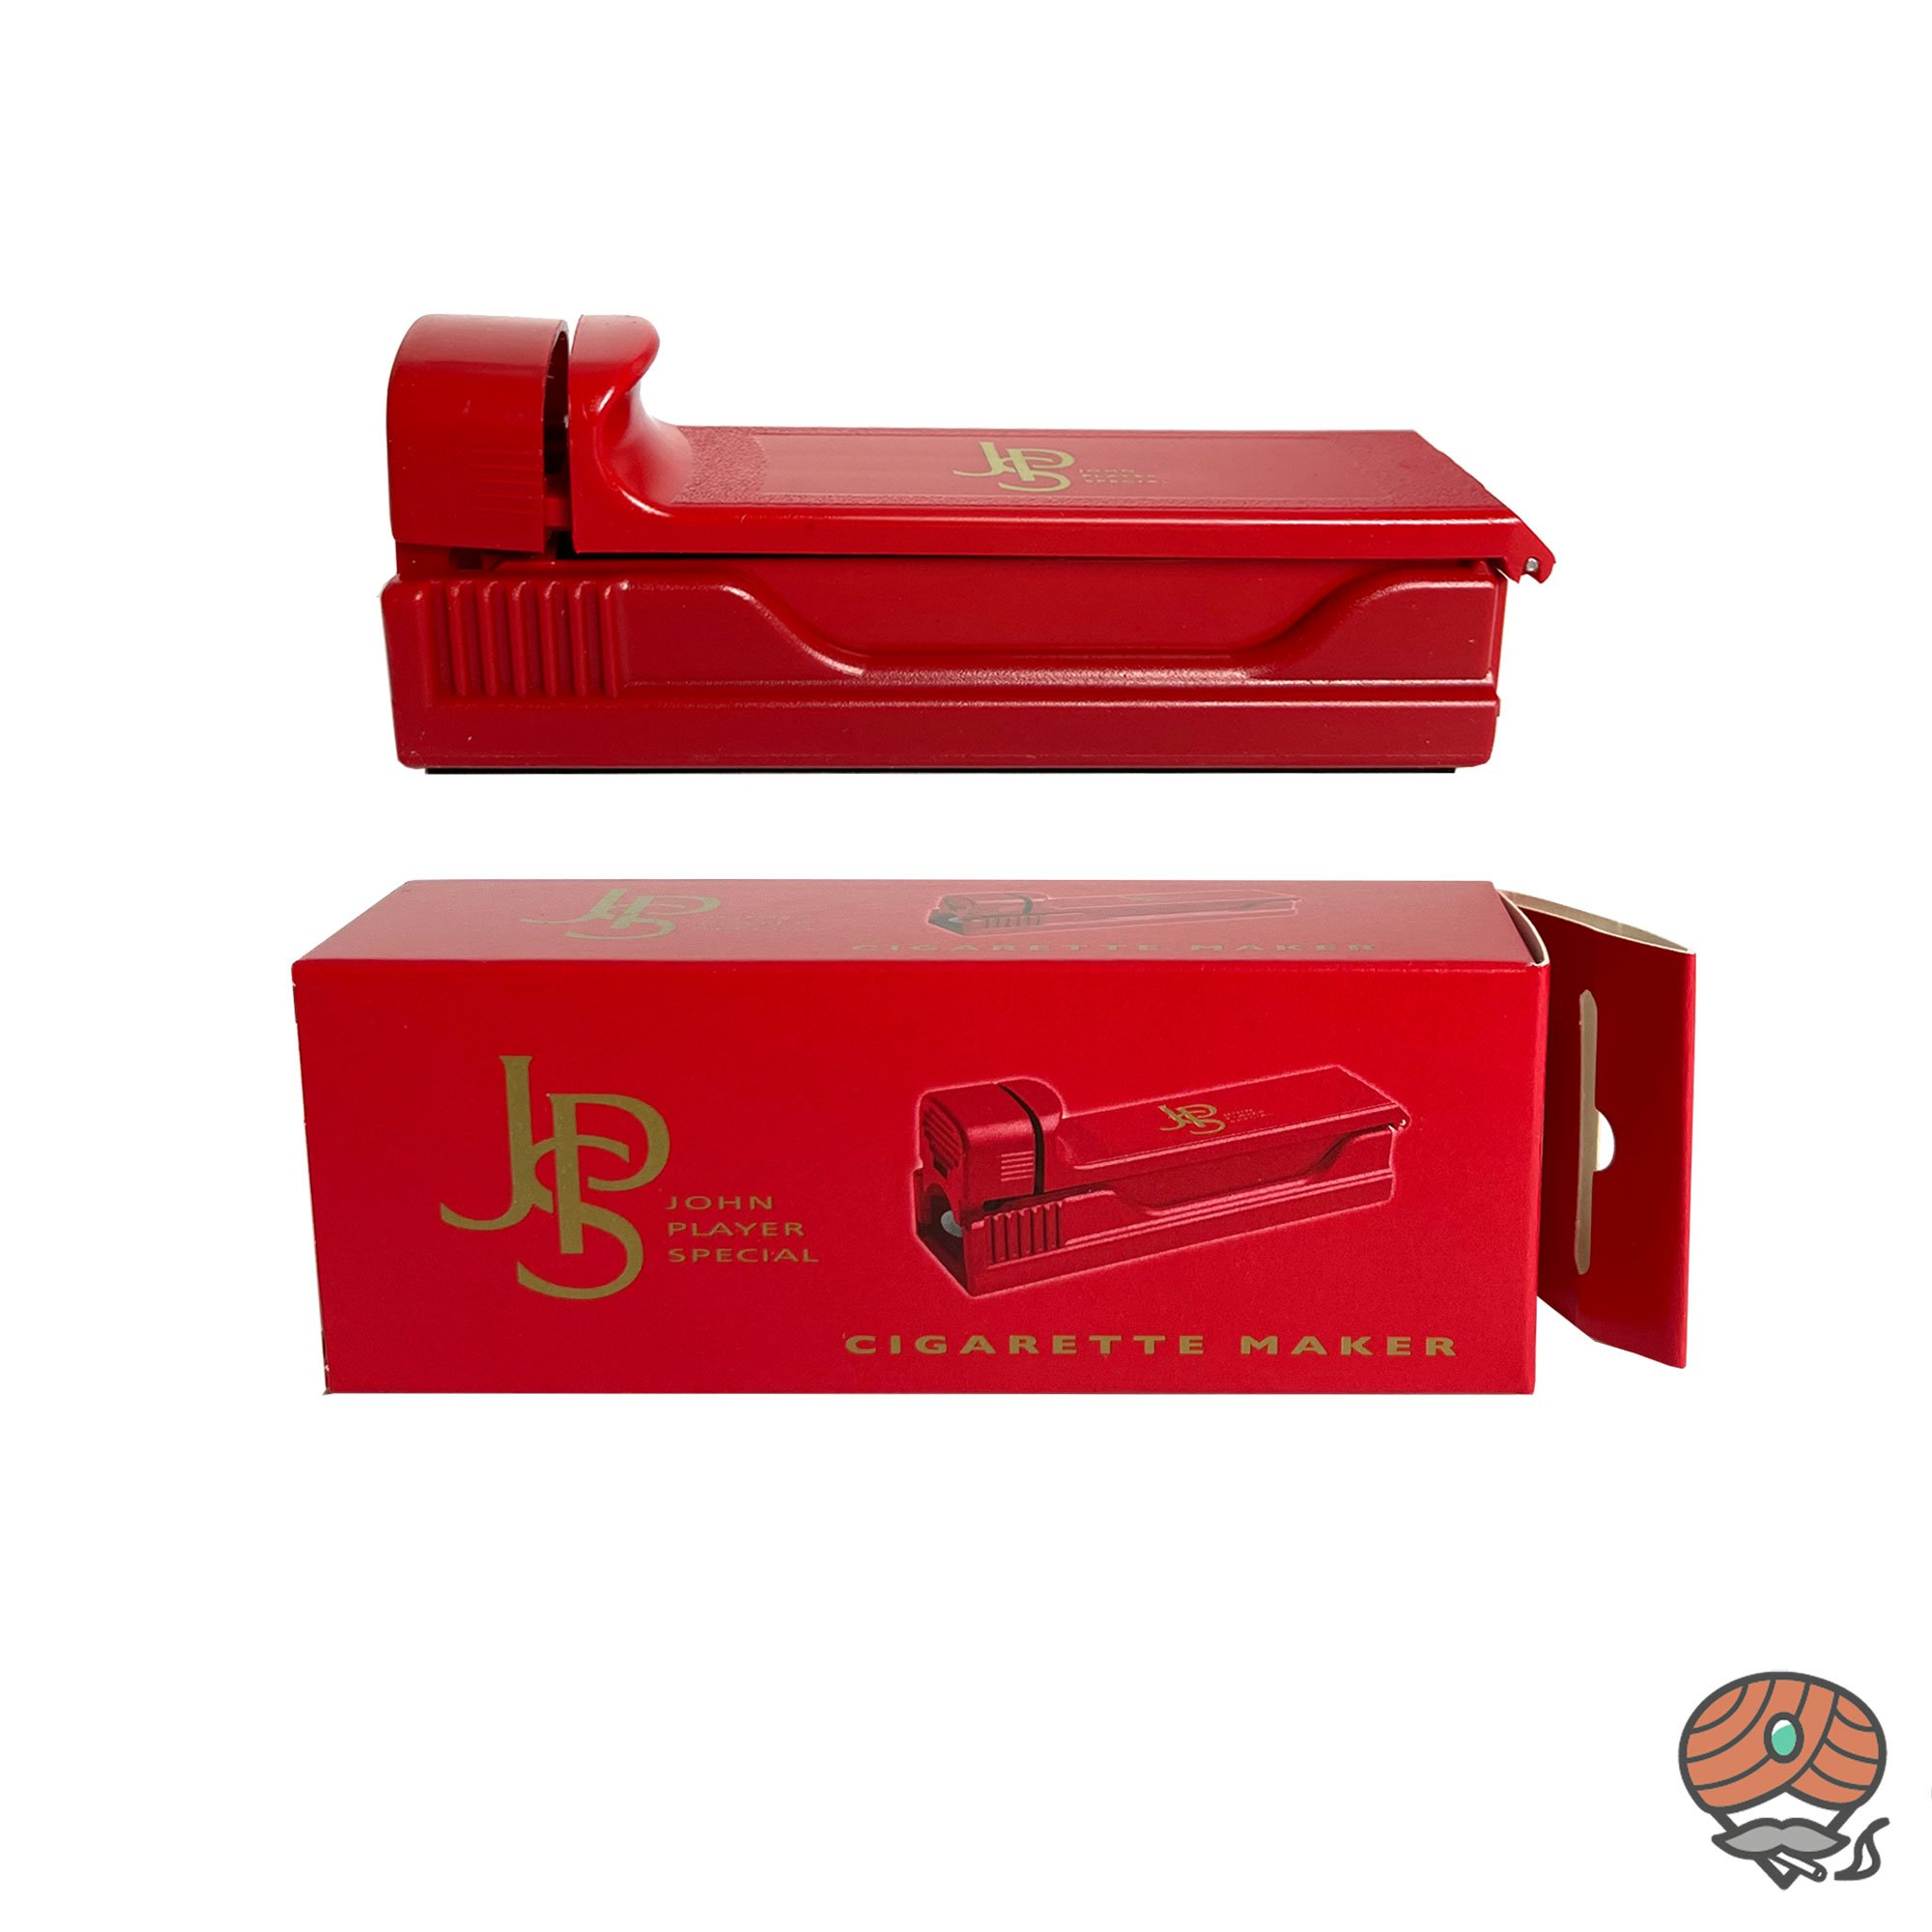 John Player Special (JPS) Zigarettenstopfer für King Size Hülsen